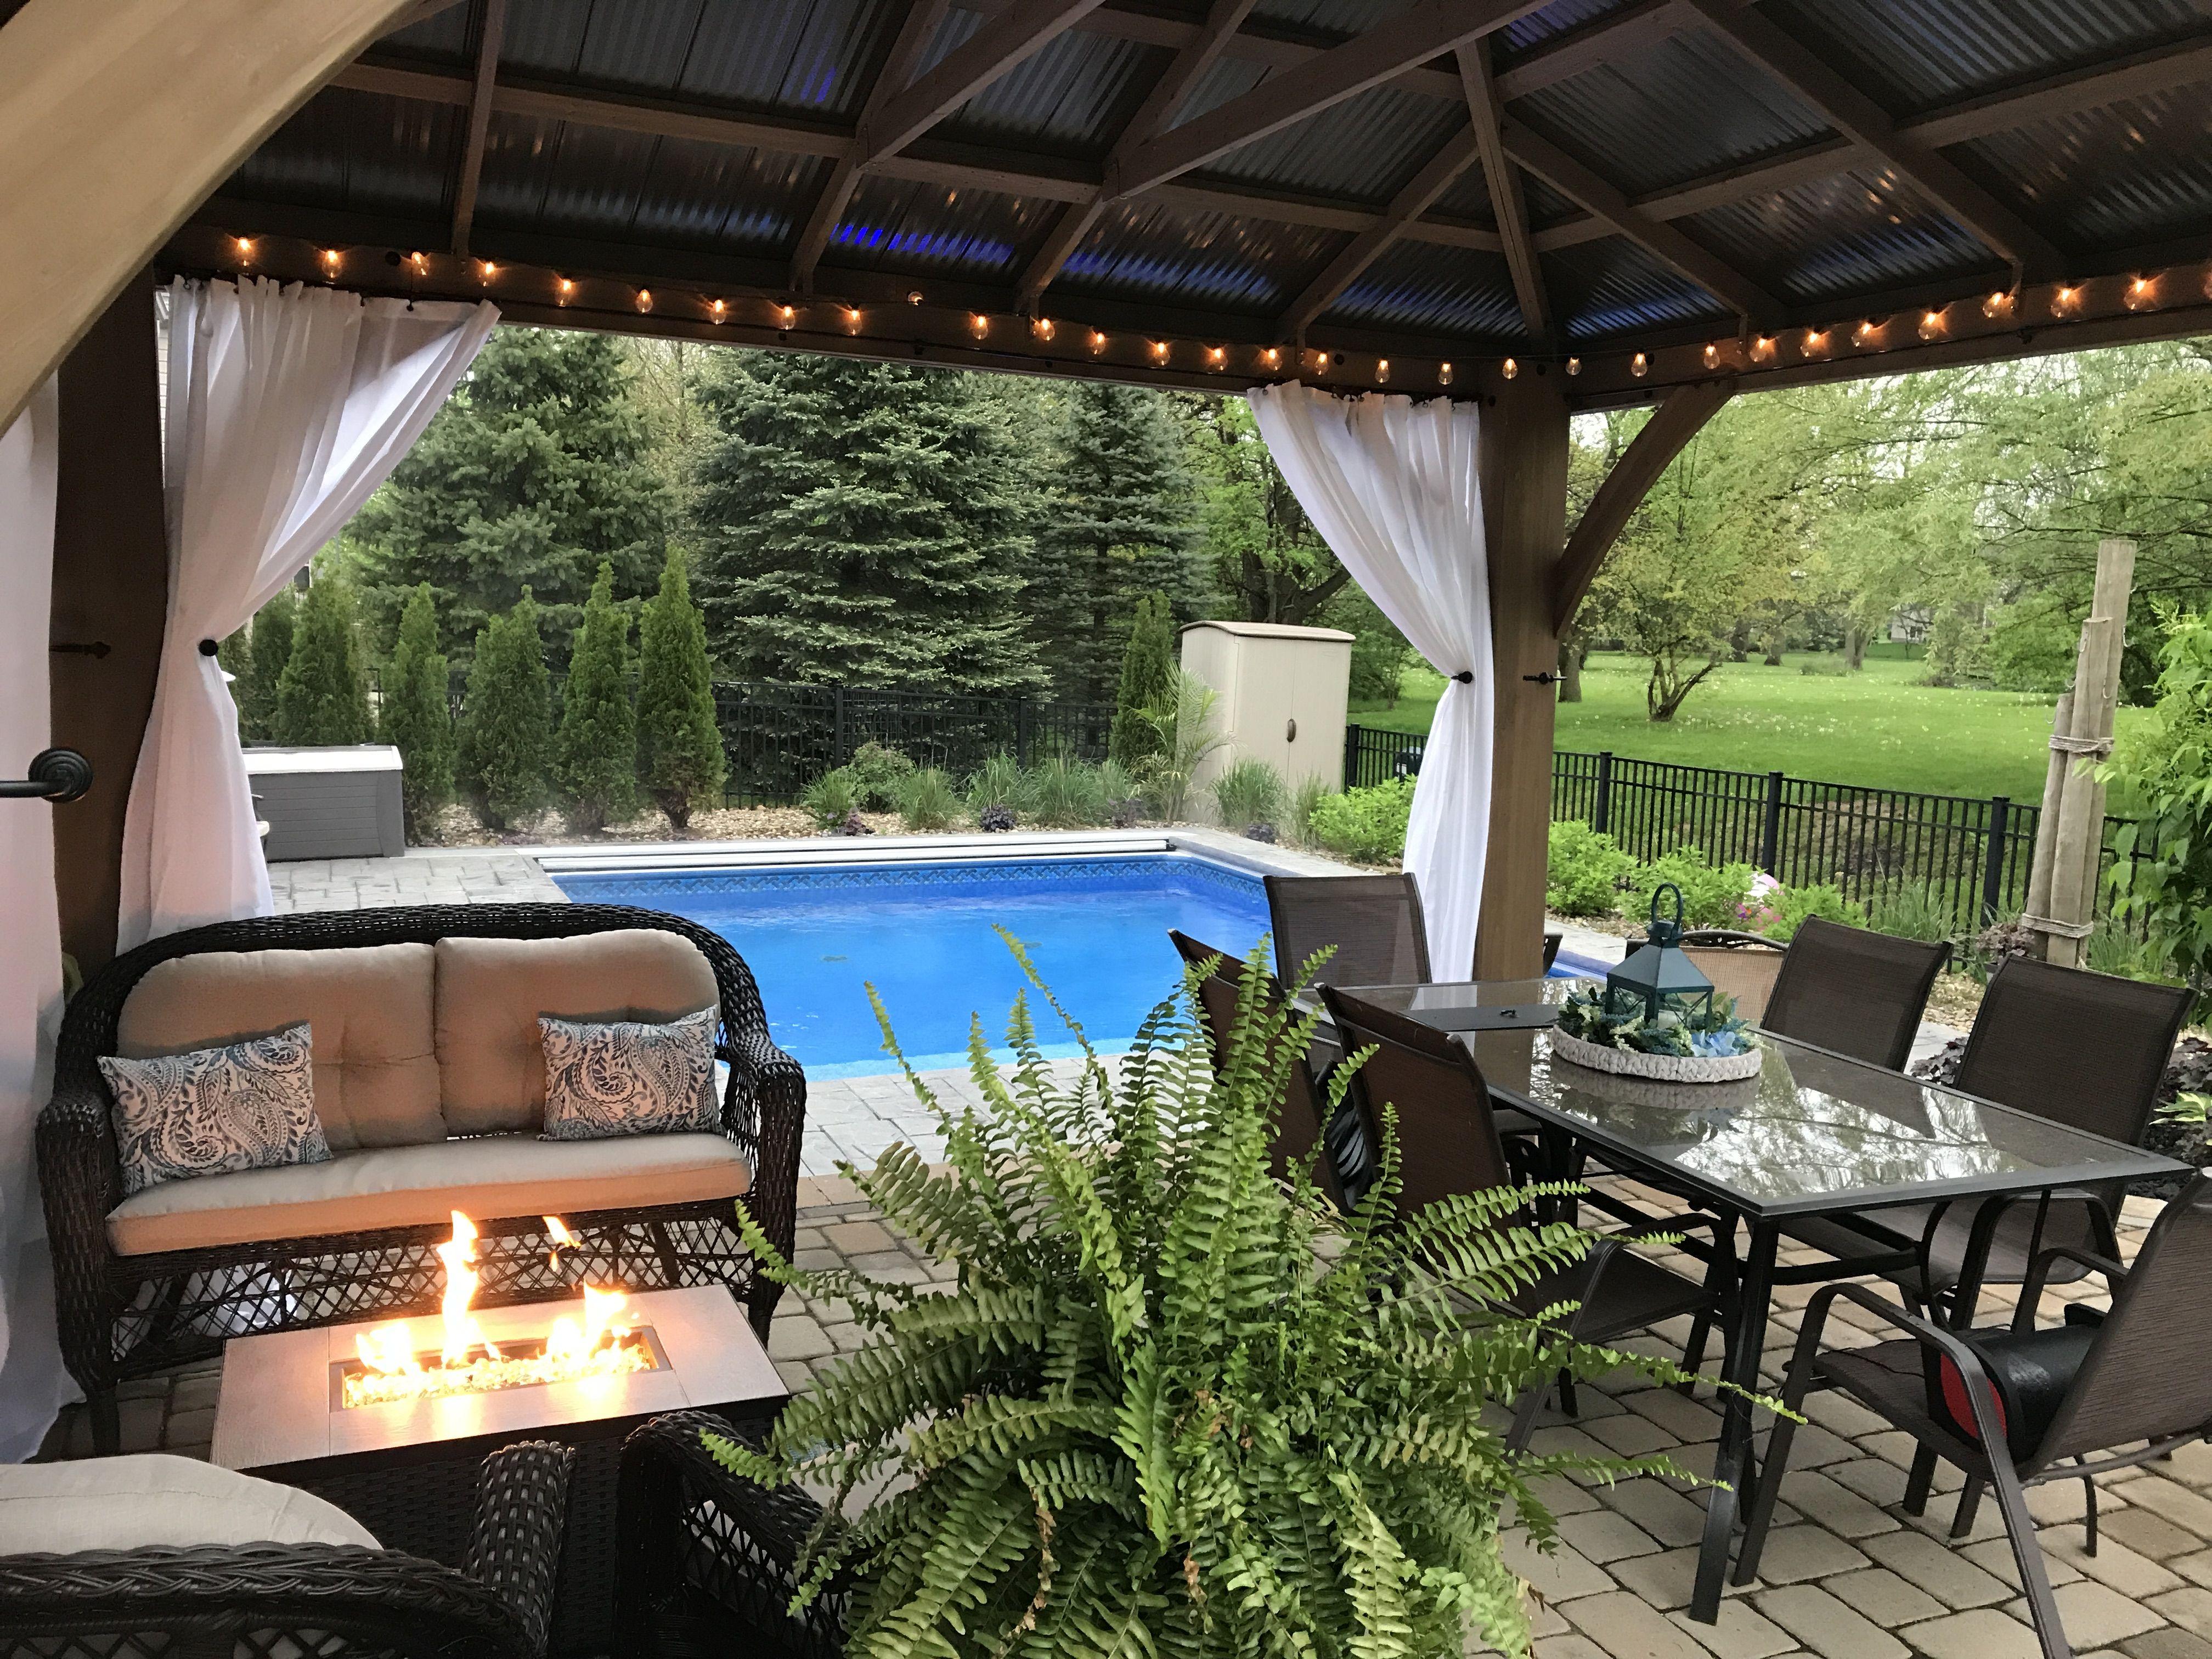 Pergola and fire pit table with pool Pergola, Pergola